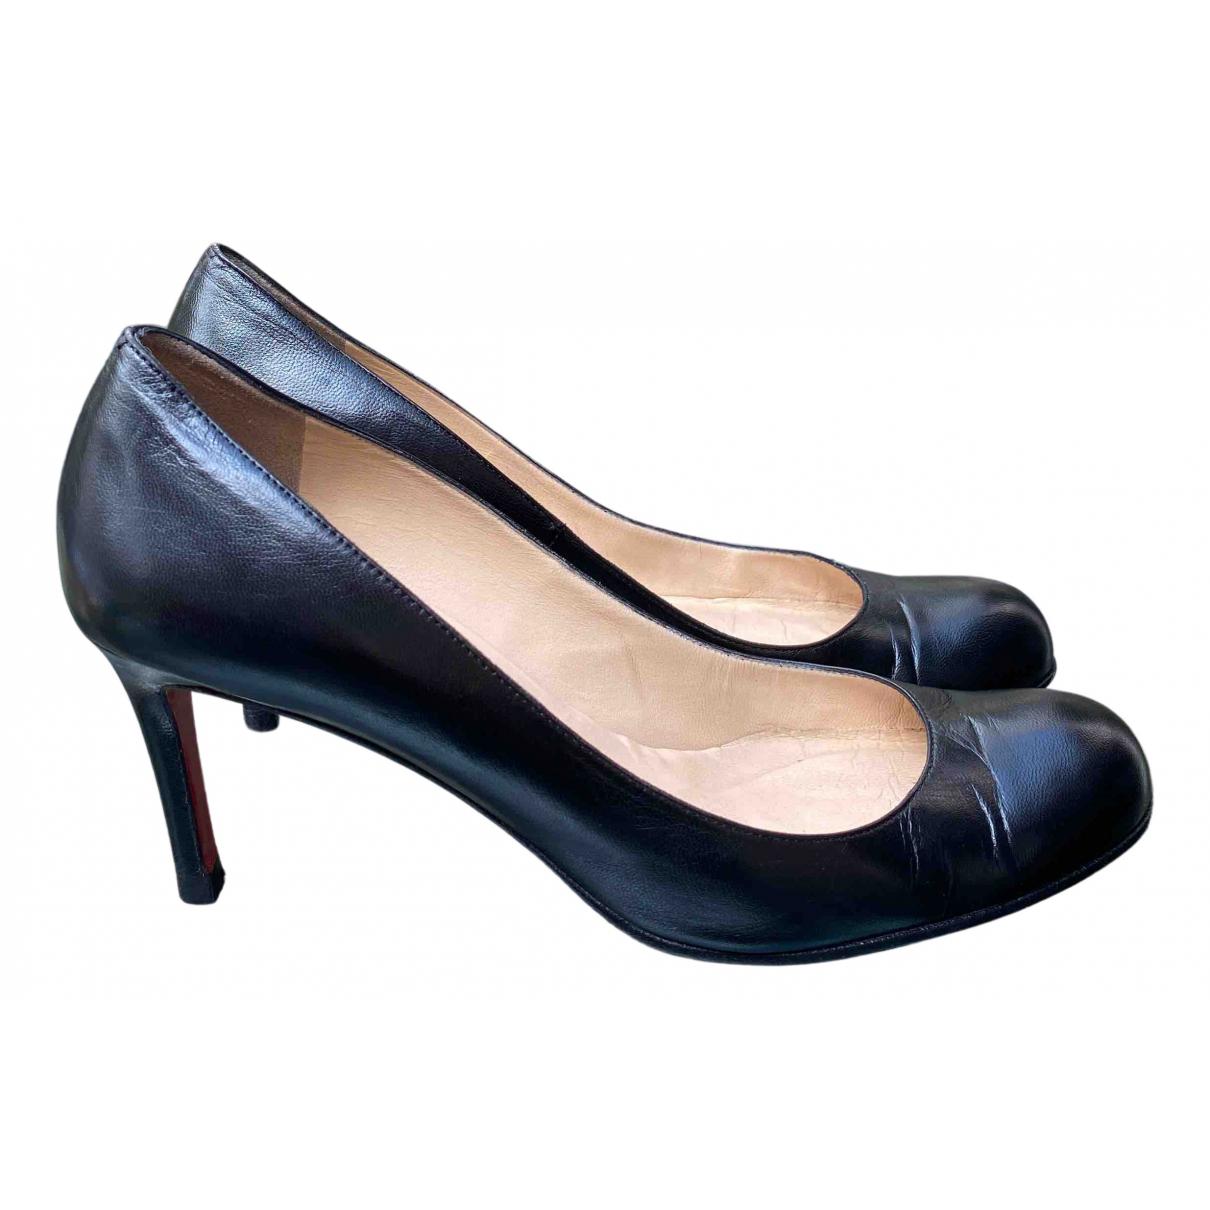 Christian Louboutin Simple pump Black Leather Heels for Women 38 EU